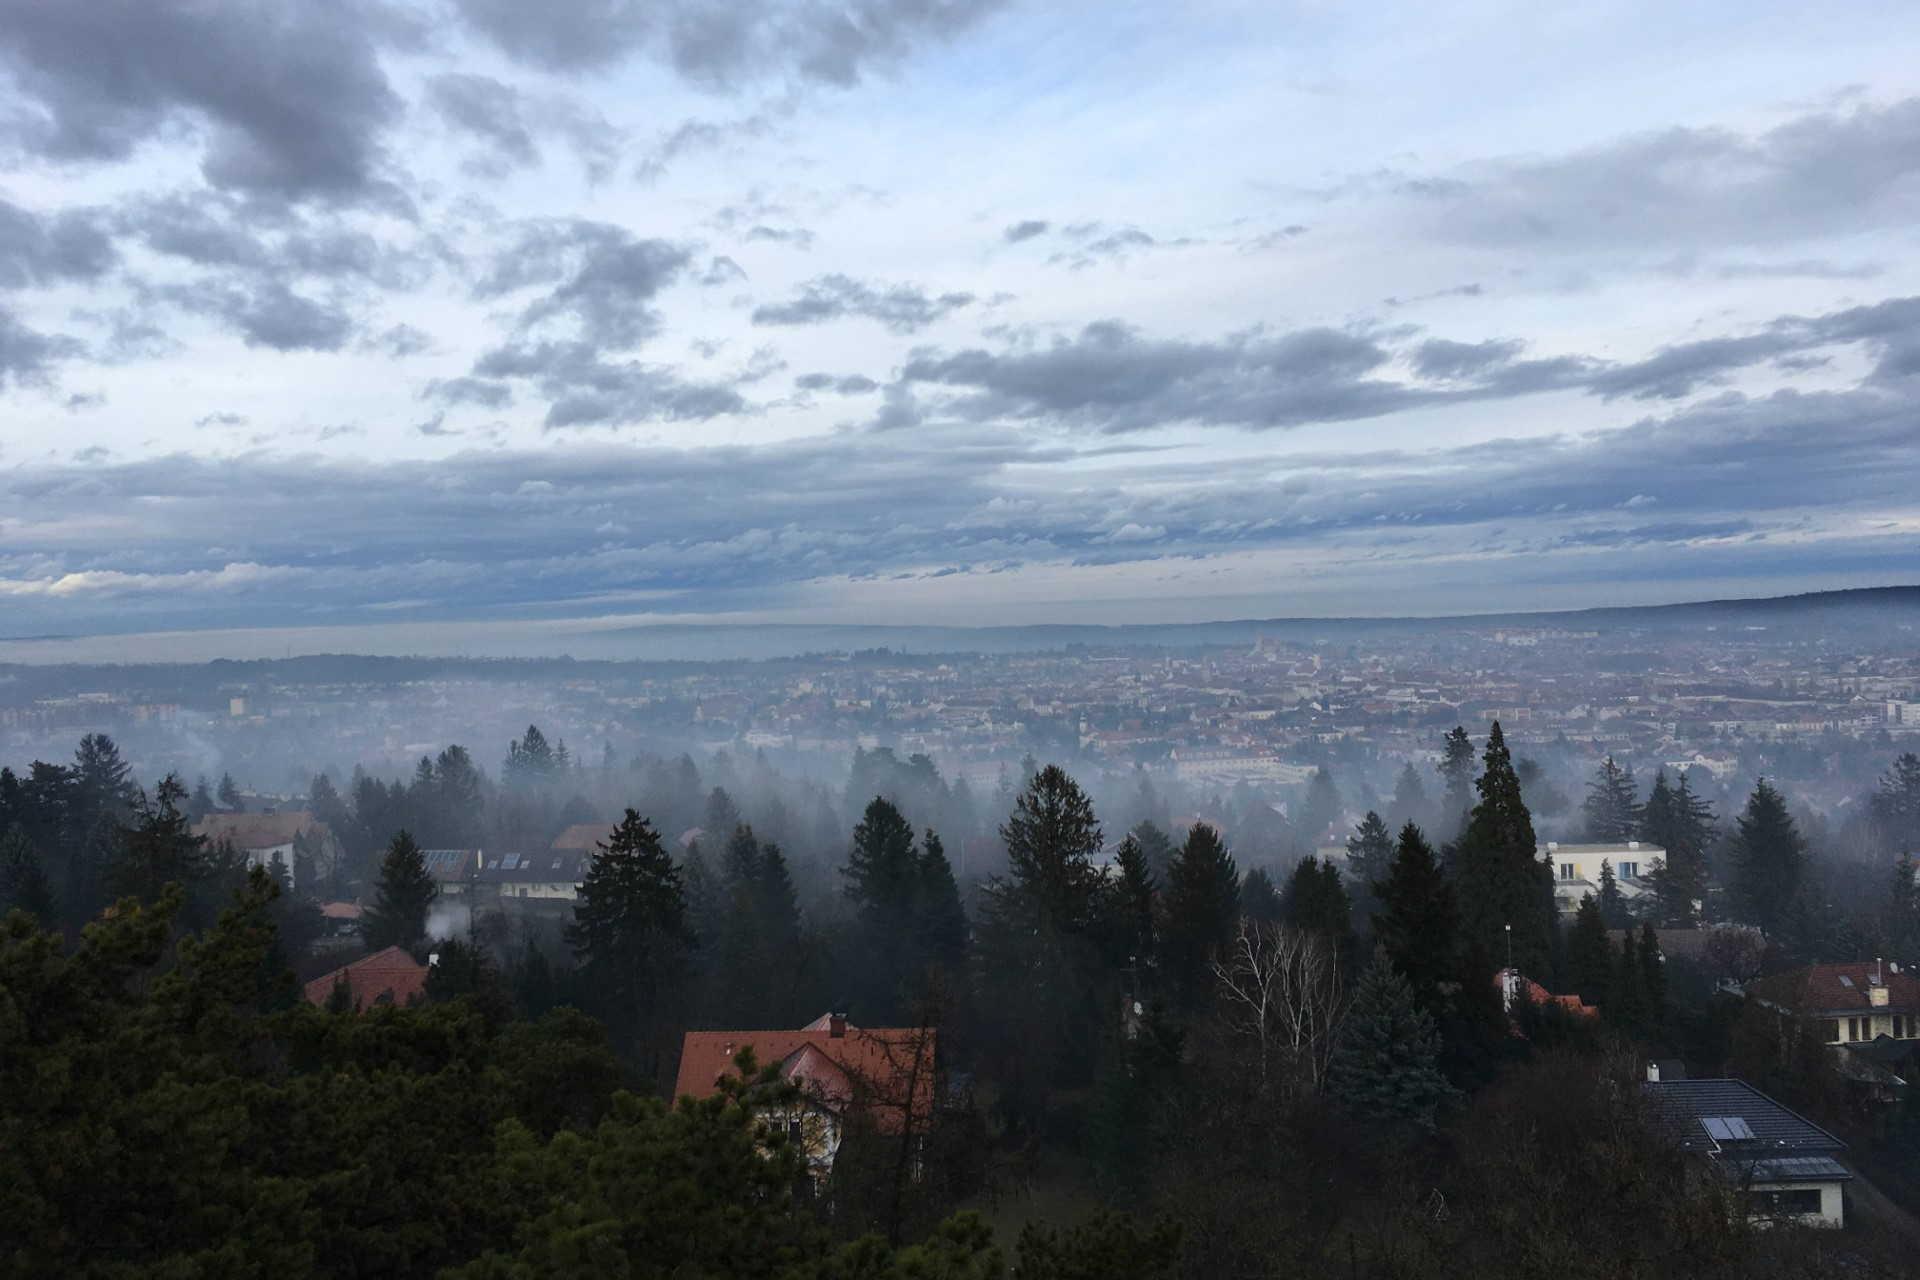 Ködös város